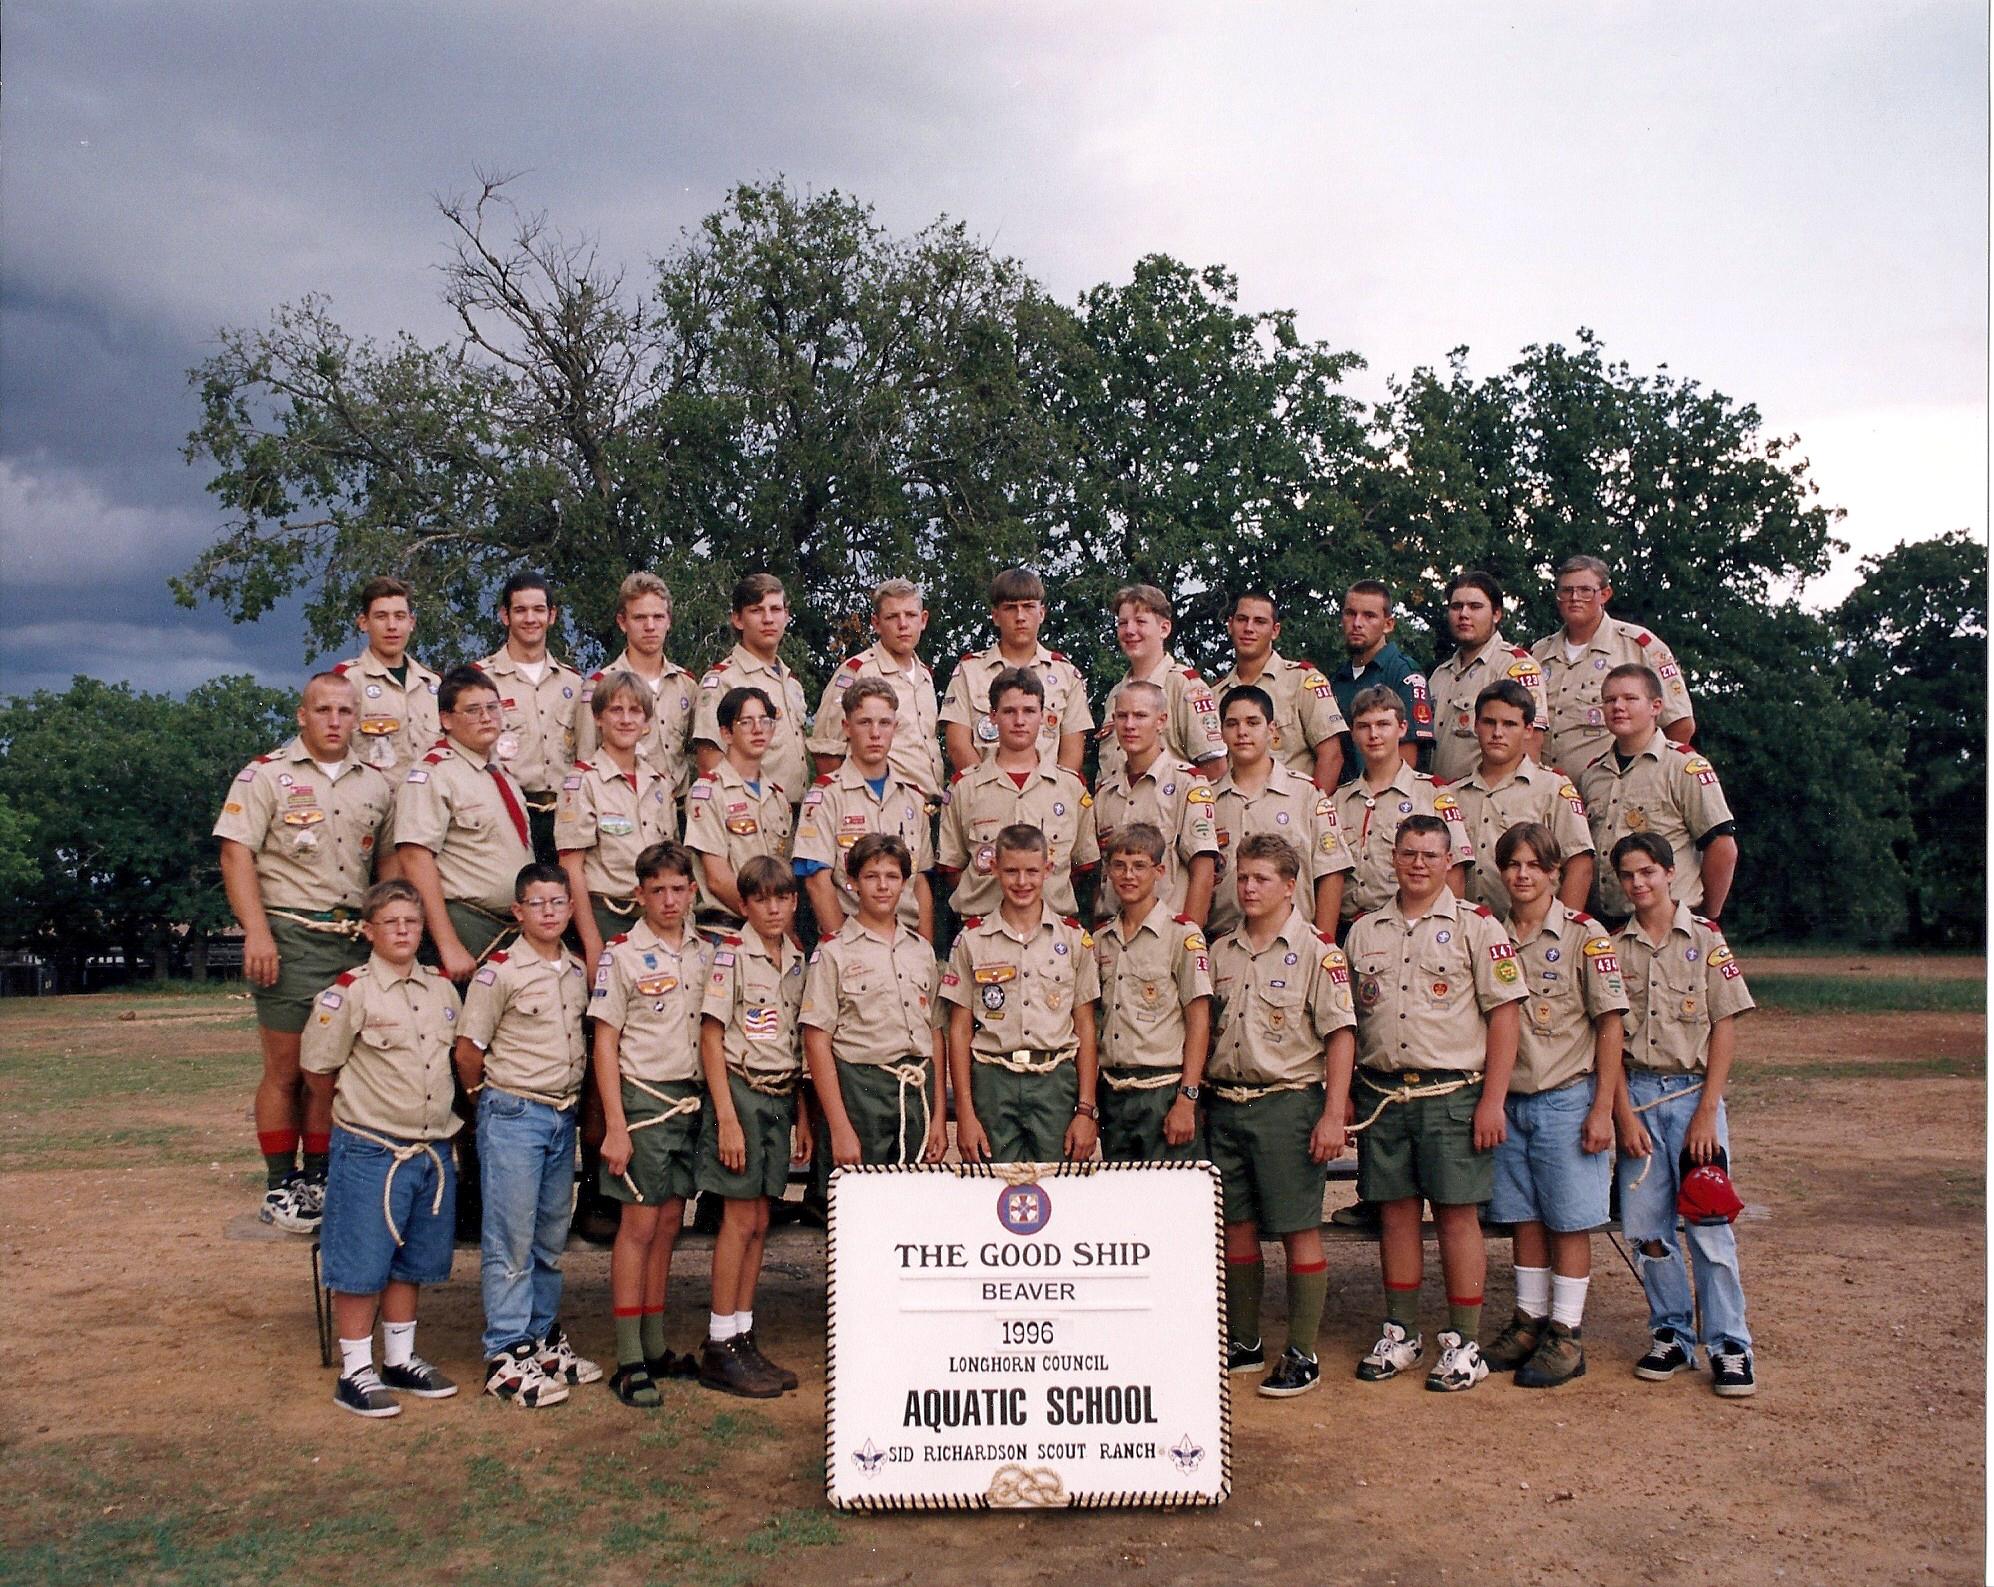 1996 Beaver copy.jpg